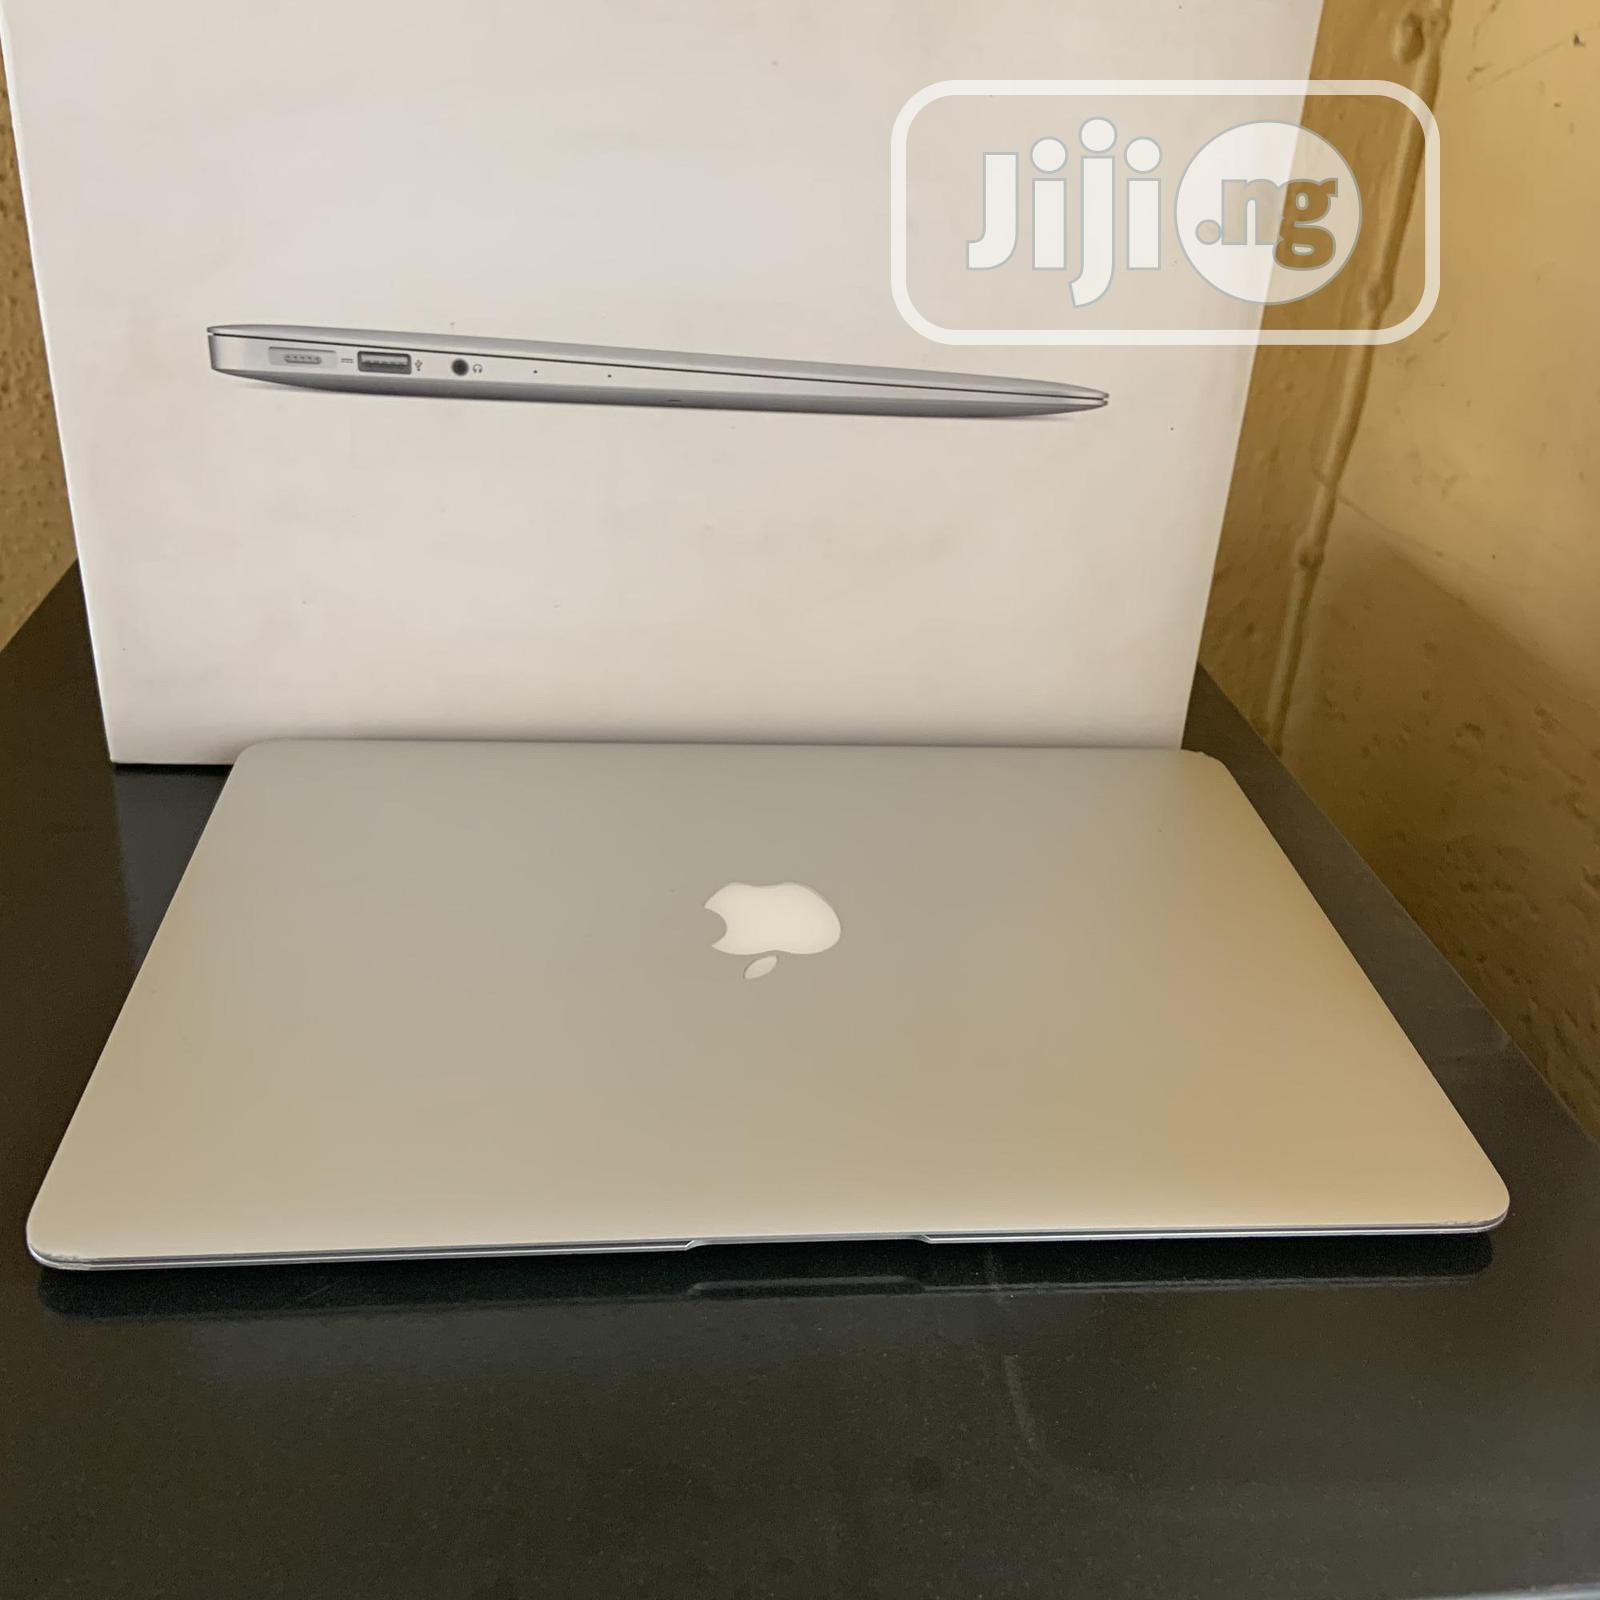 Laptop Apple MacBook Air 8GB Intel Core I7 SSD 128GB   Laptops & Computers for sale in Ikeja, Lagos State, Nigeria